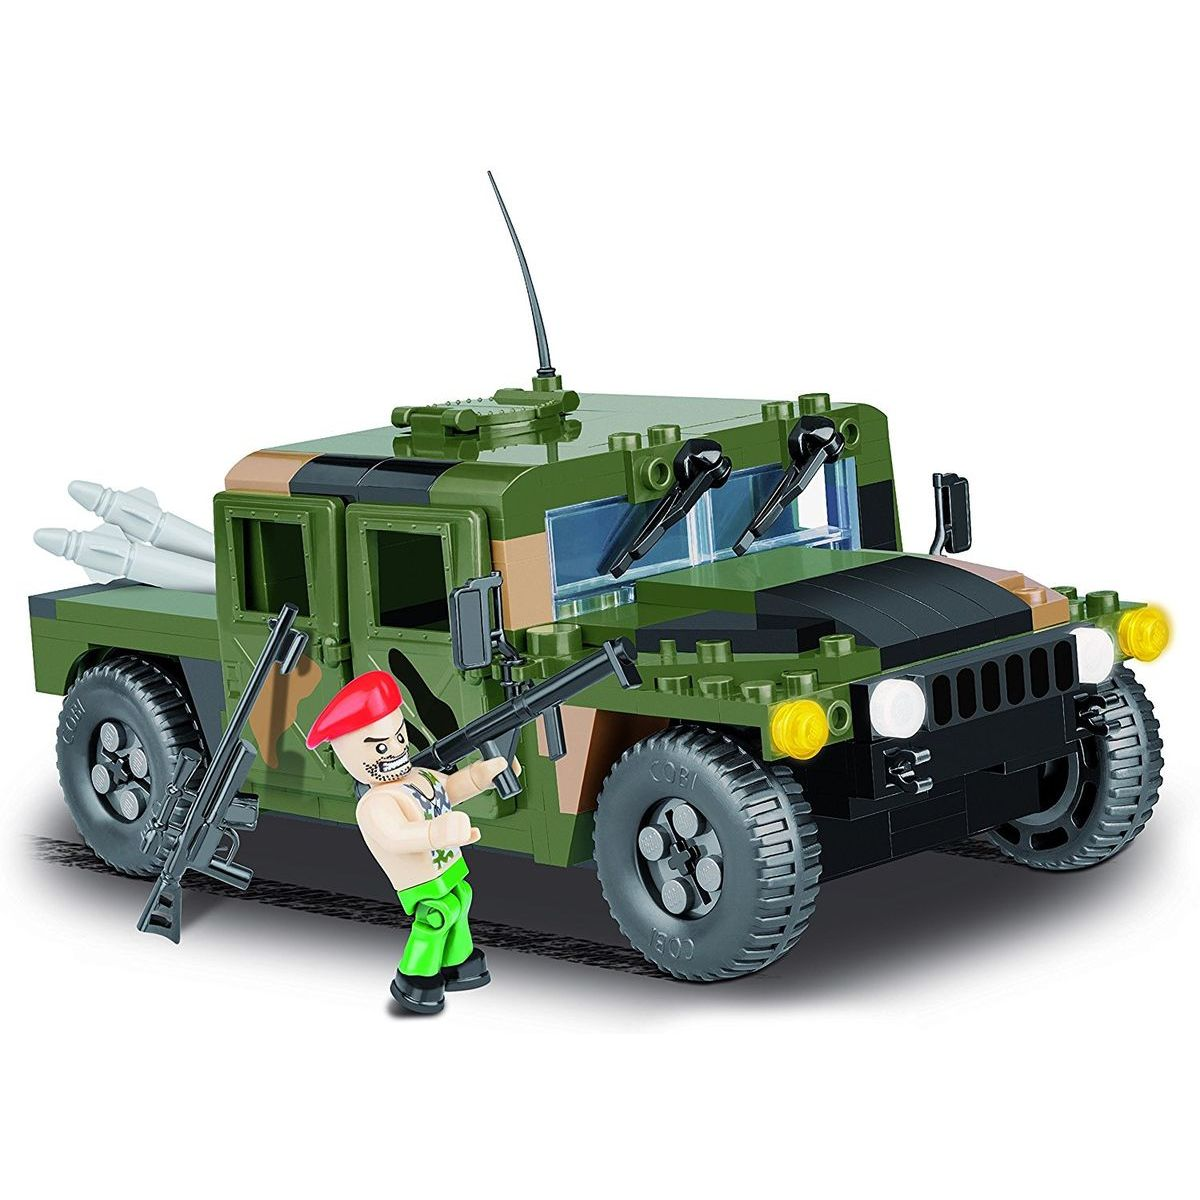 COBI 24304 Small Army NATO Armored vehicle 255 k, 1 f